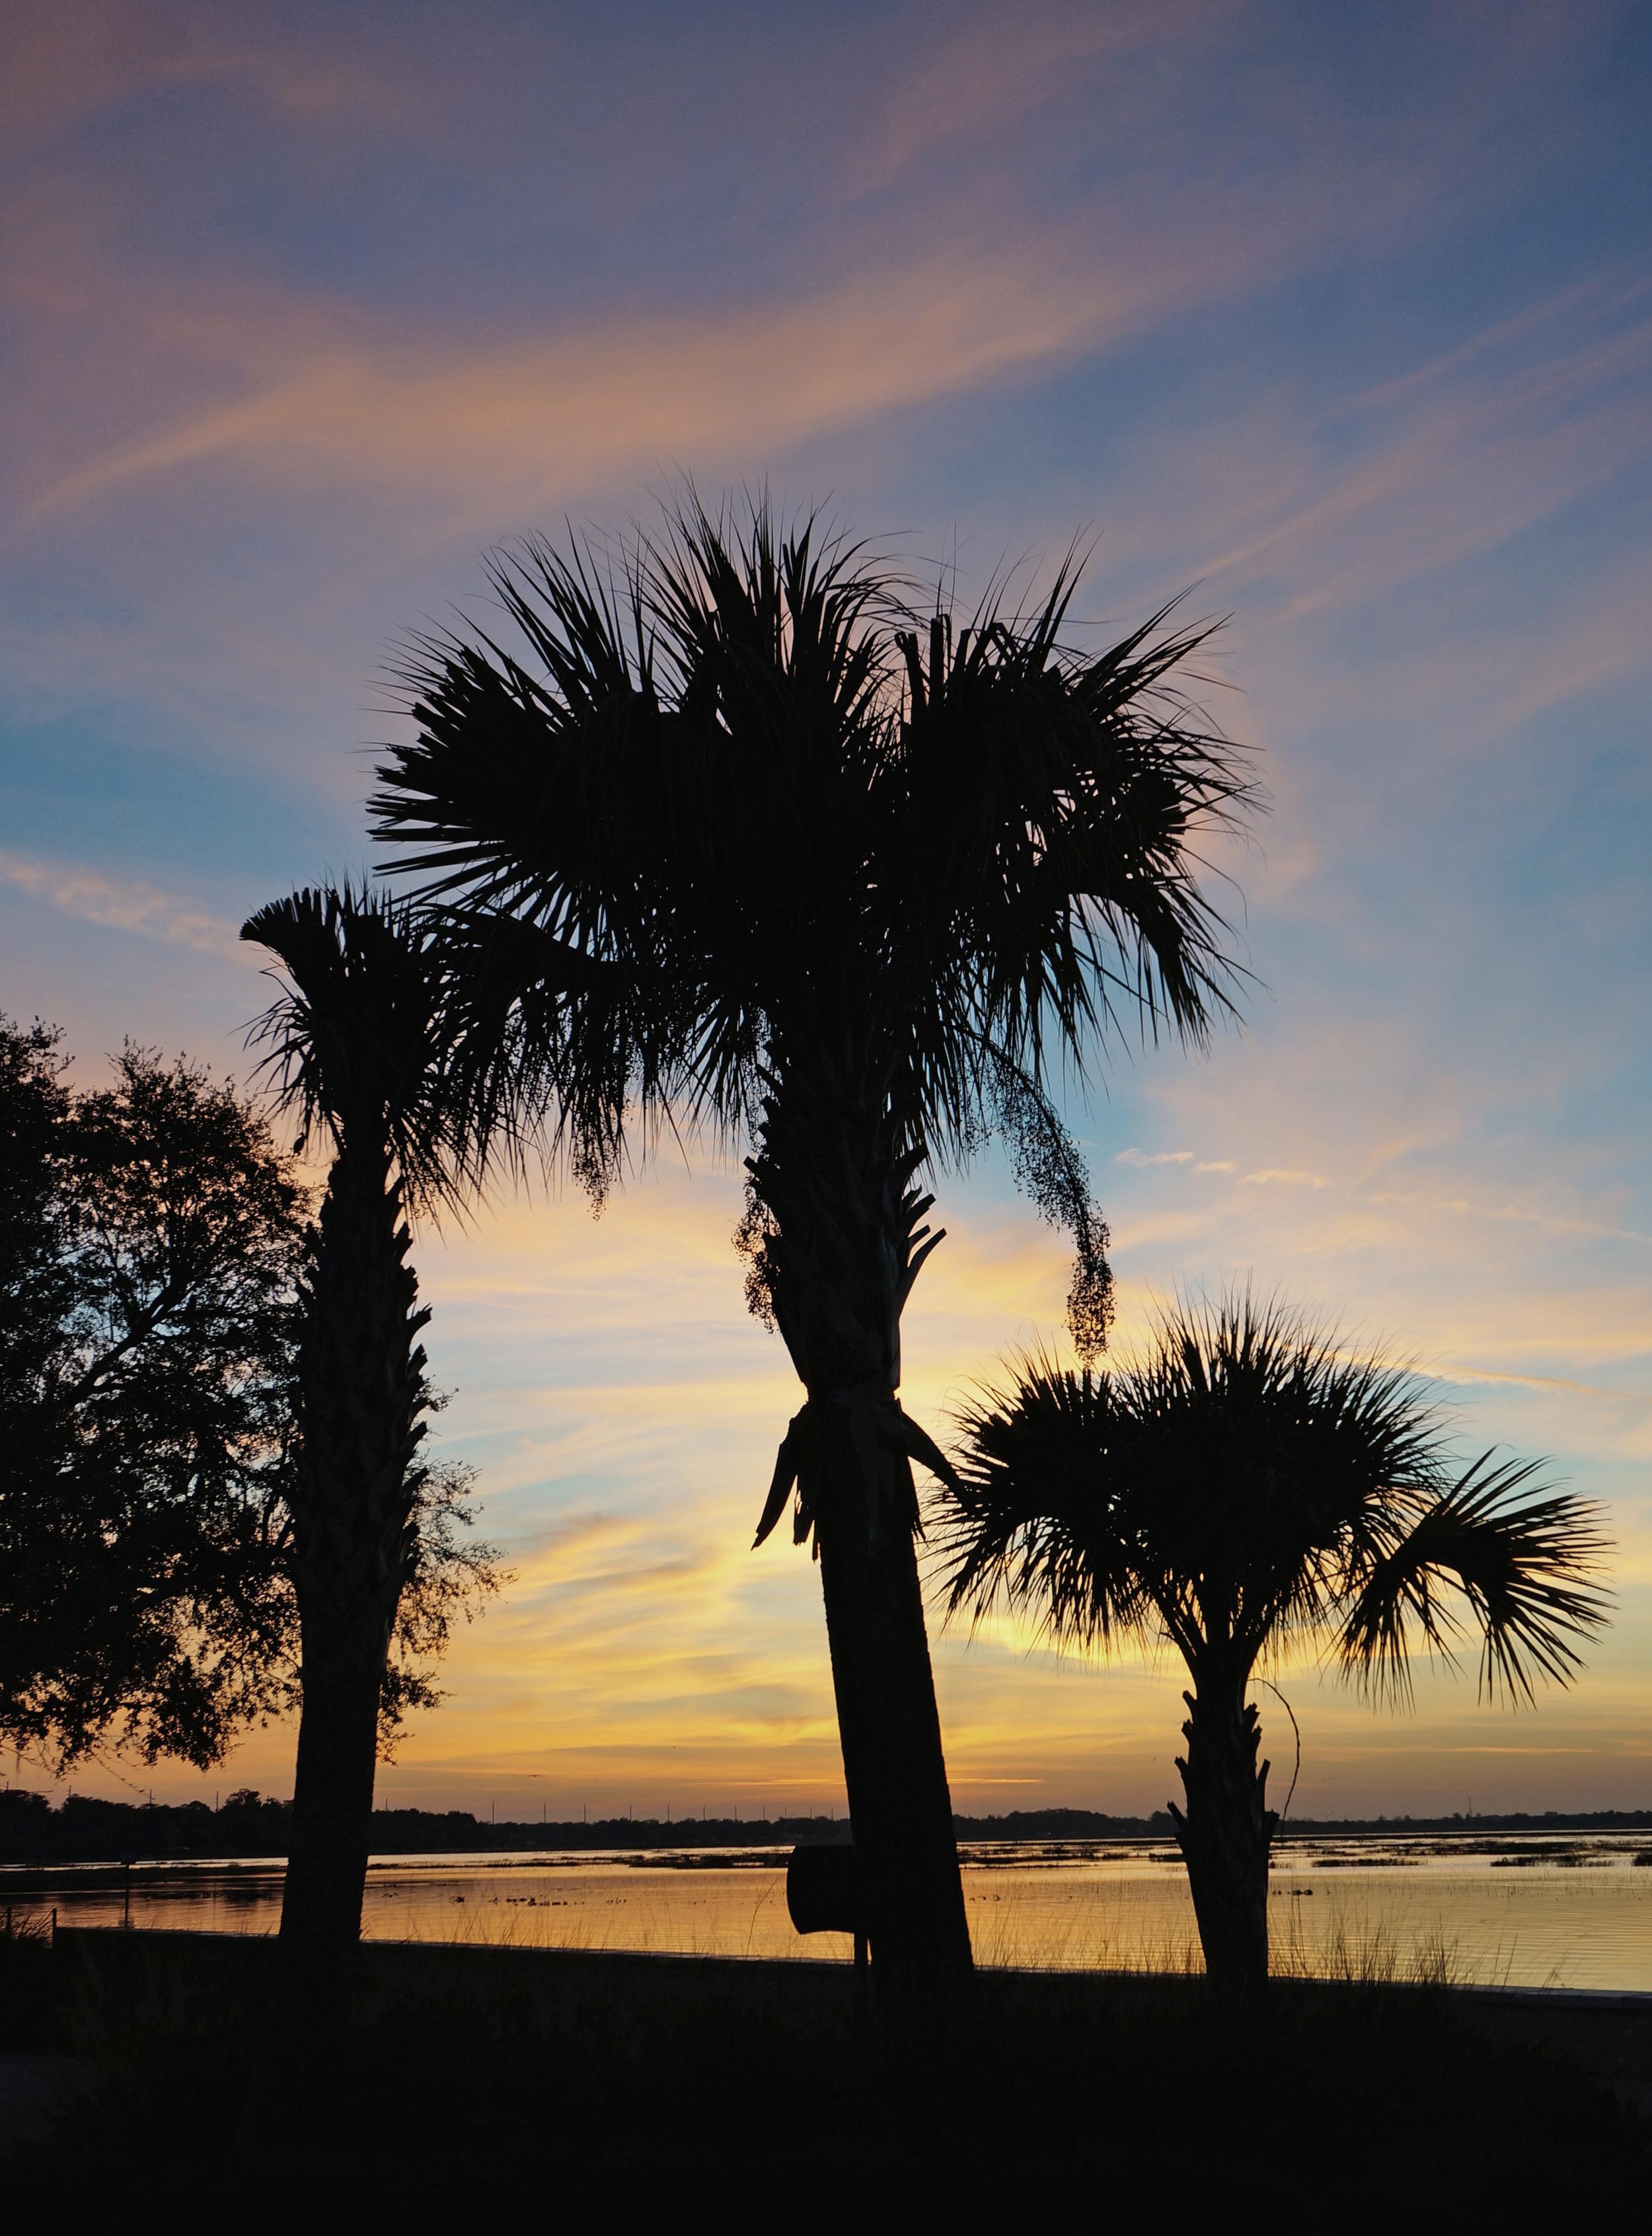 Shadowed Palms